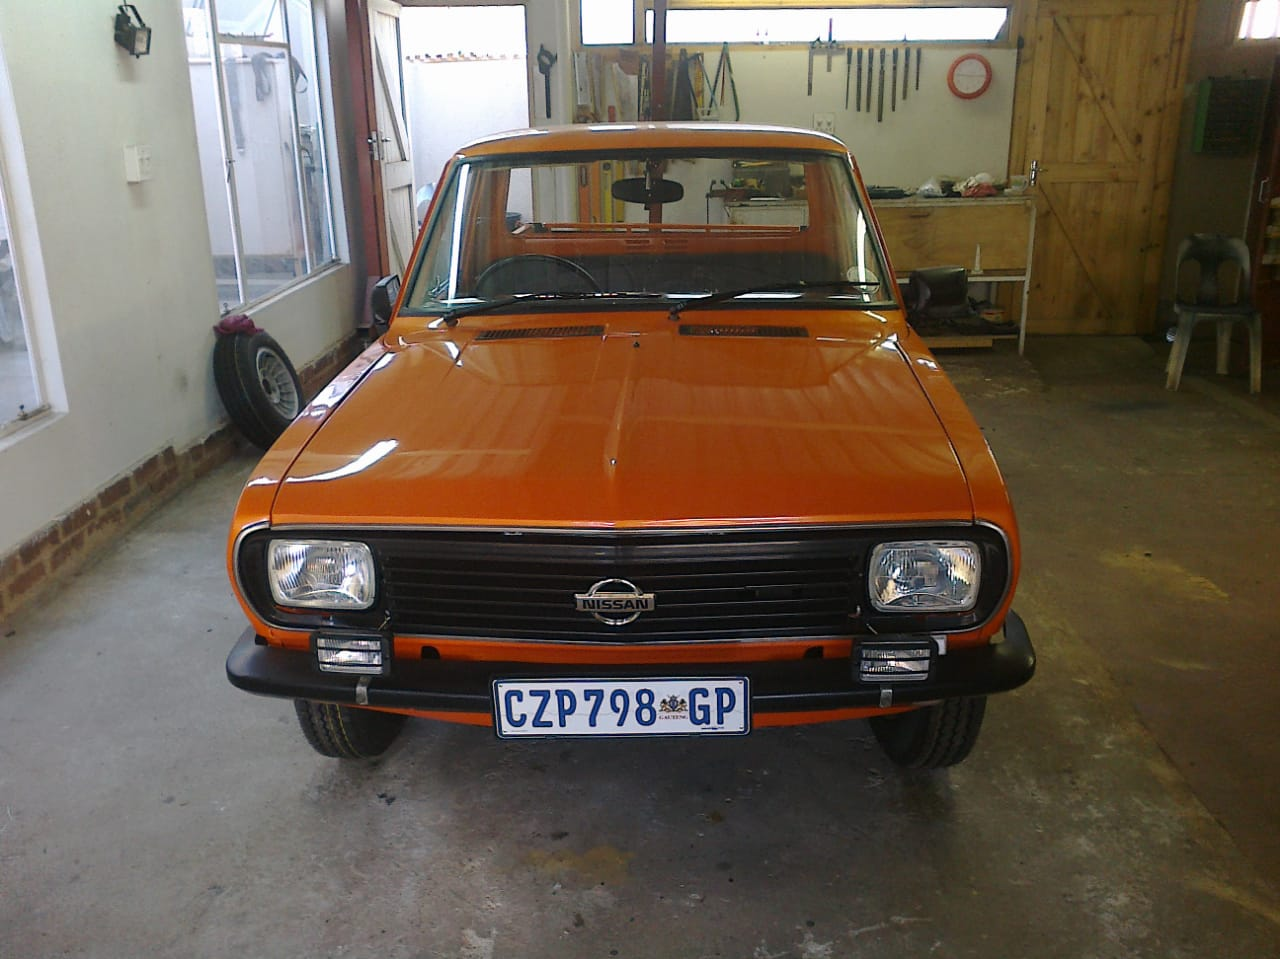 1997 Nissan 1400 Champ